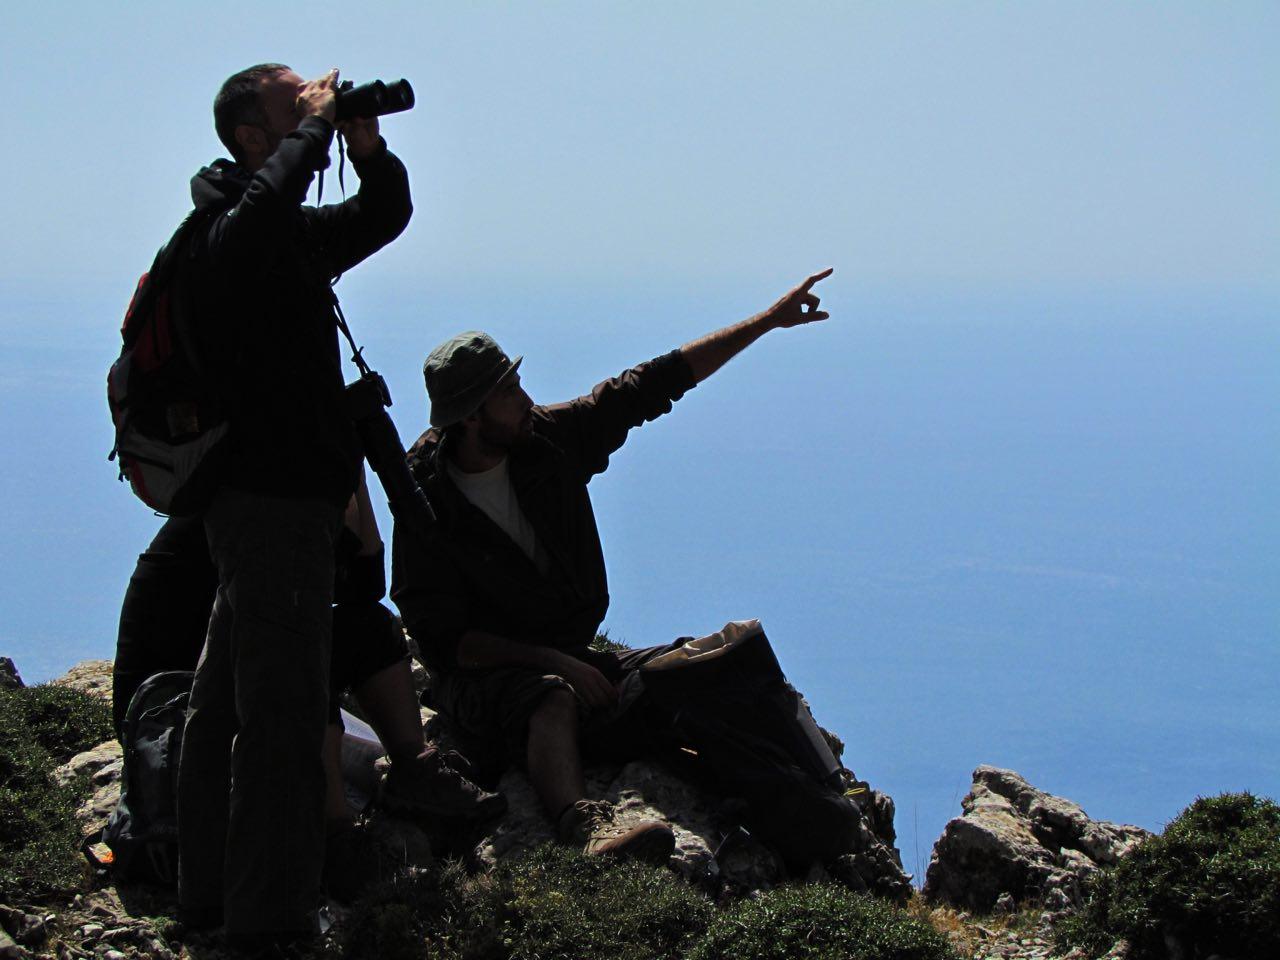 Trekking platania gorge amari, Bird Watching Platania Gorge Amari Valley, rethimno birdwatching, rethymno crete birdwatching, psiloritis geopark crete, natura 2000 crete, unesco geopark crete, activities rethimno crete, nature lovers activities crete